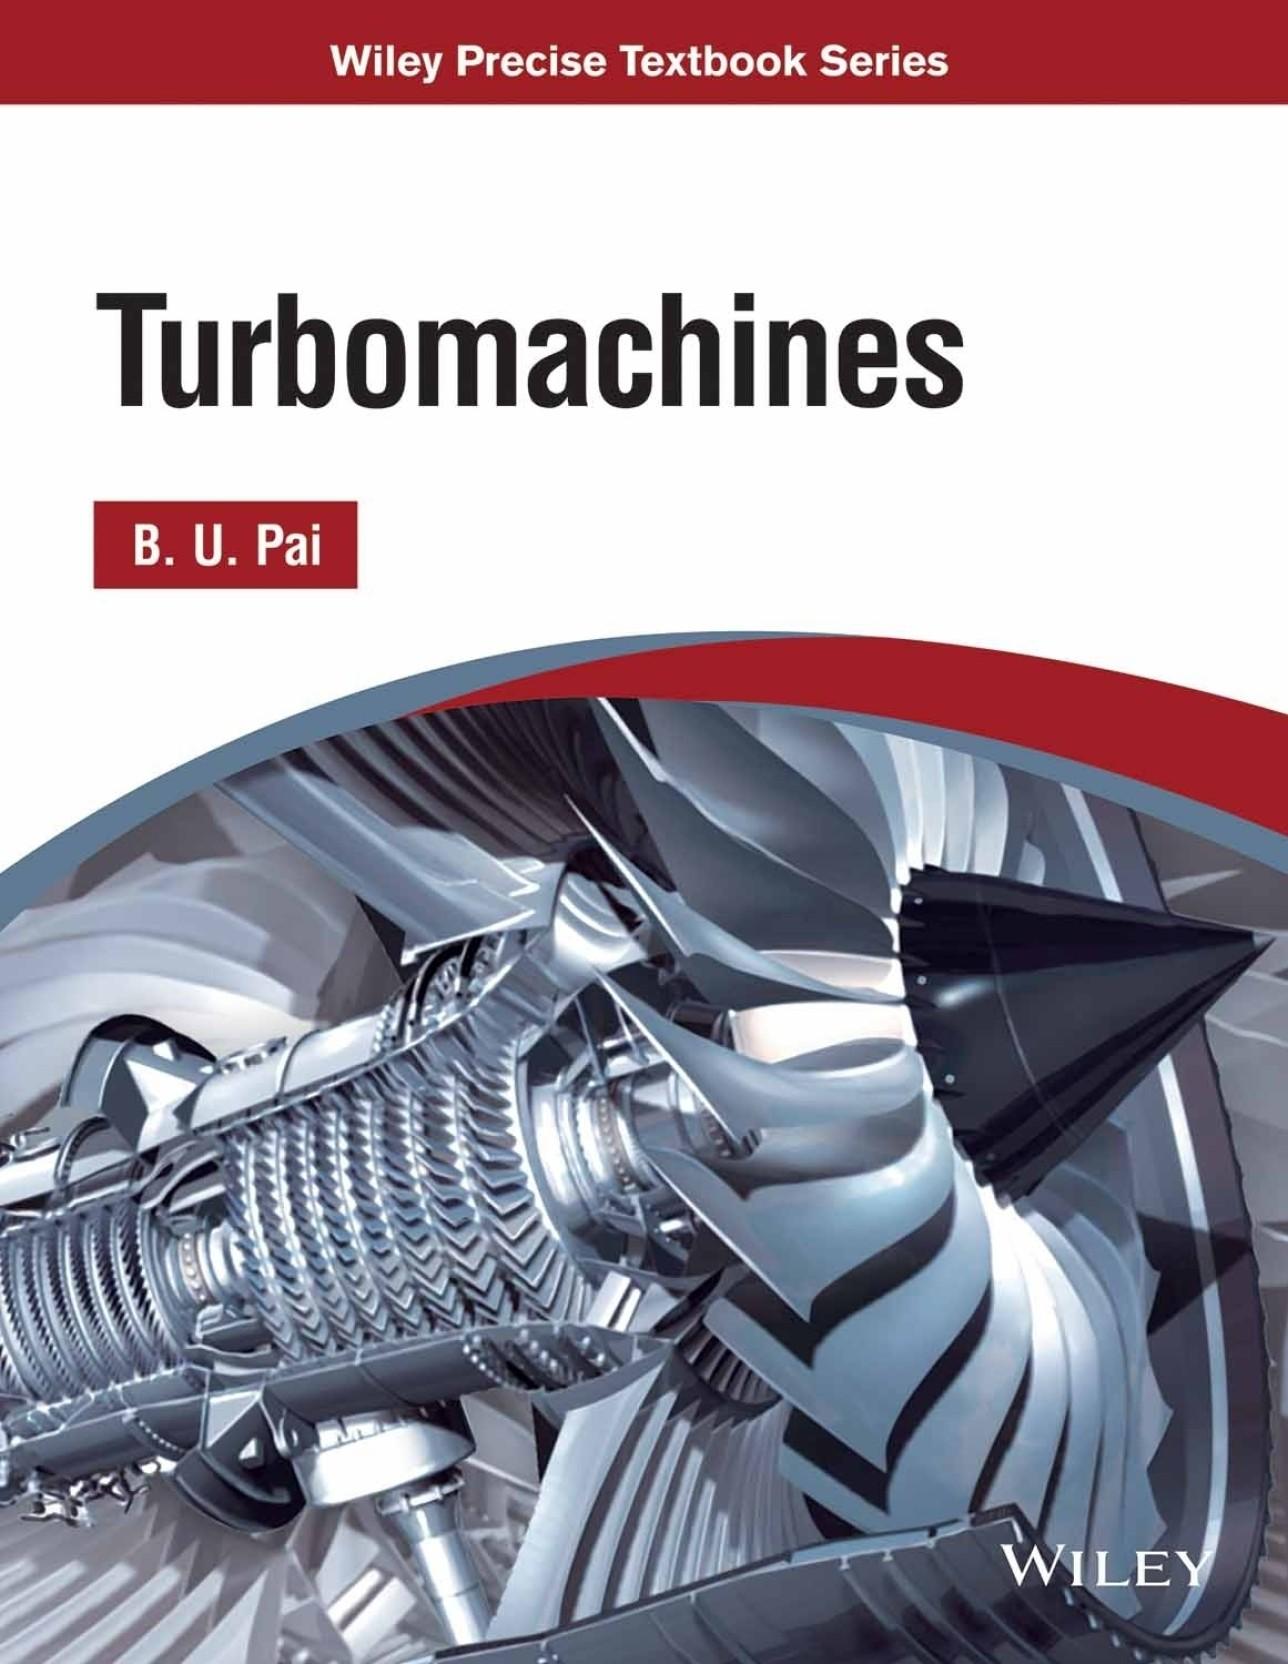 Turbomachines Buy Turbomachines by B U PAI line at Best